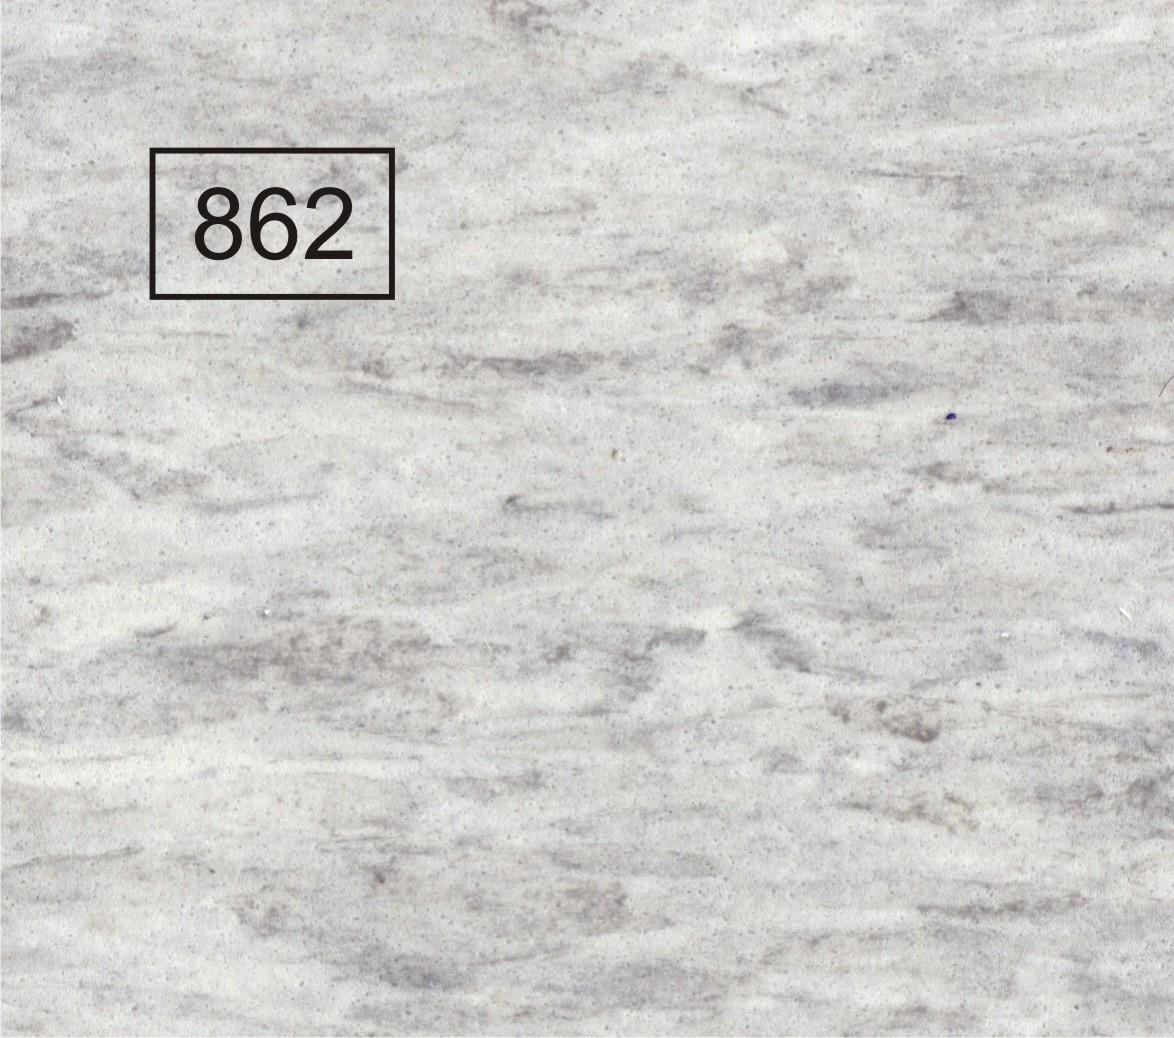 862 b